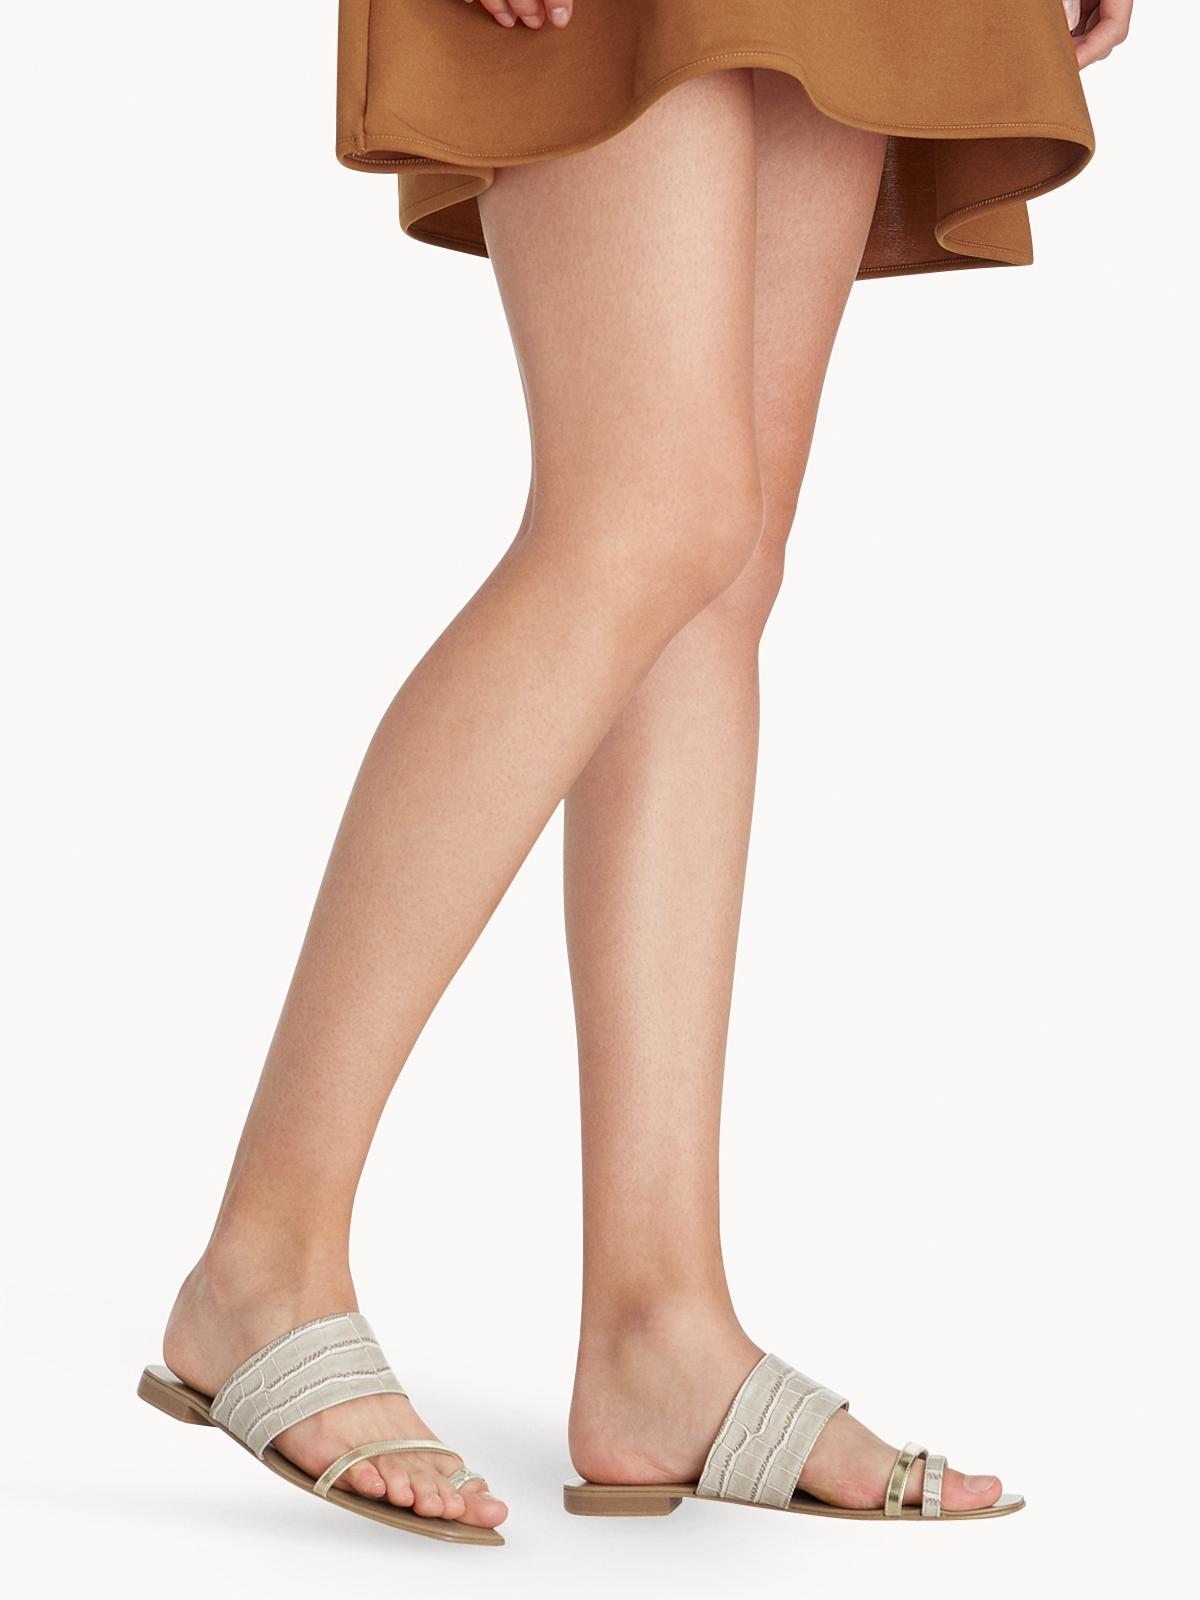 Prove Toe Ring Sandals Beige